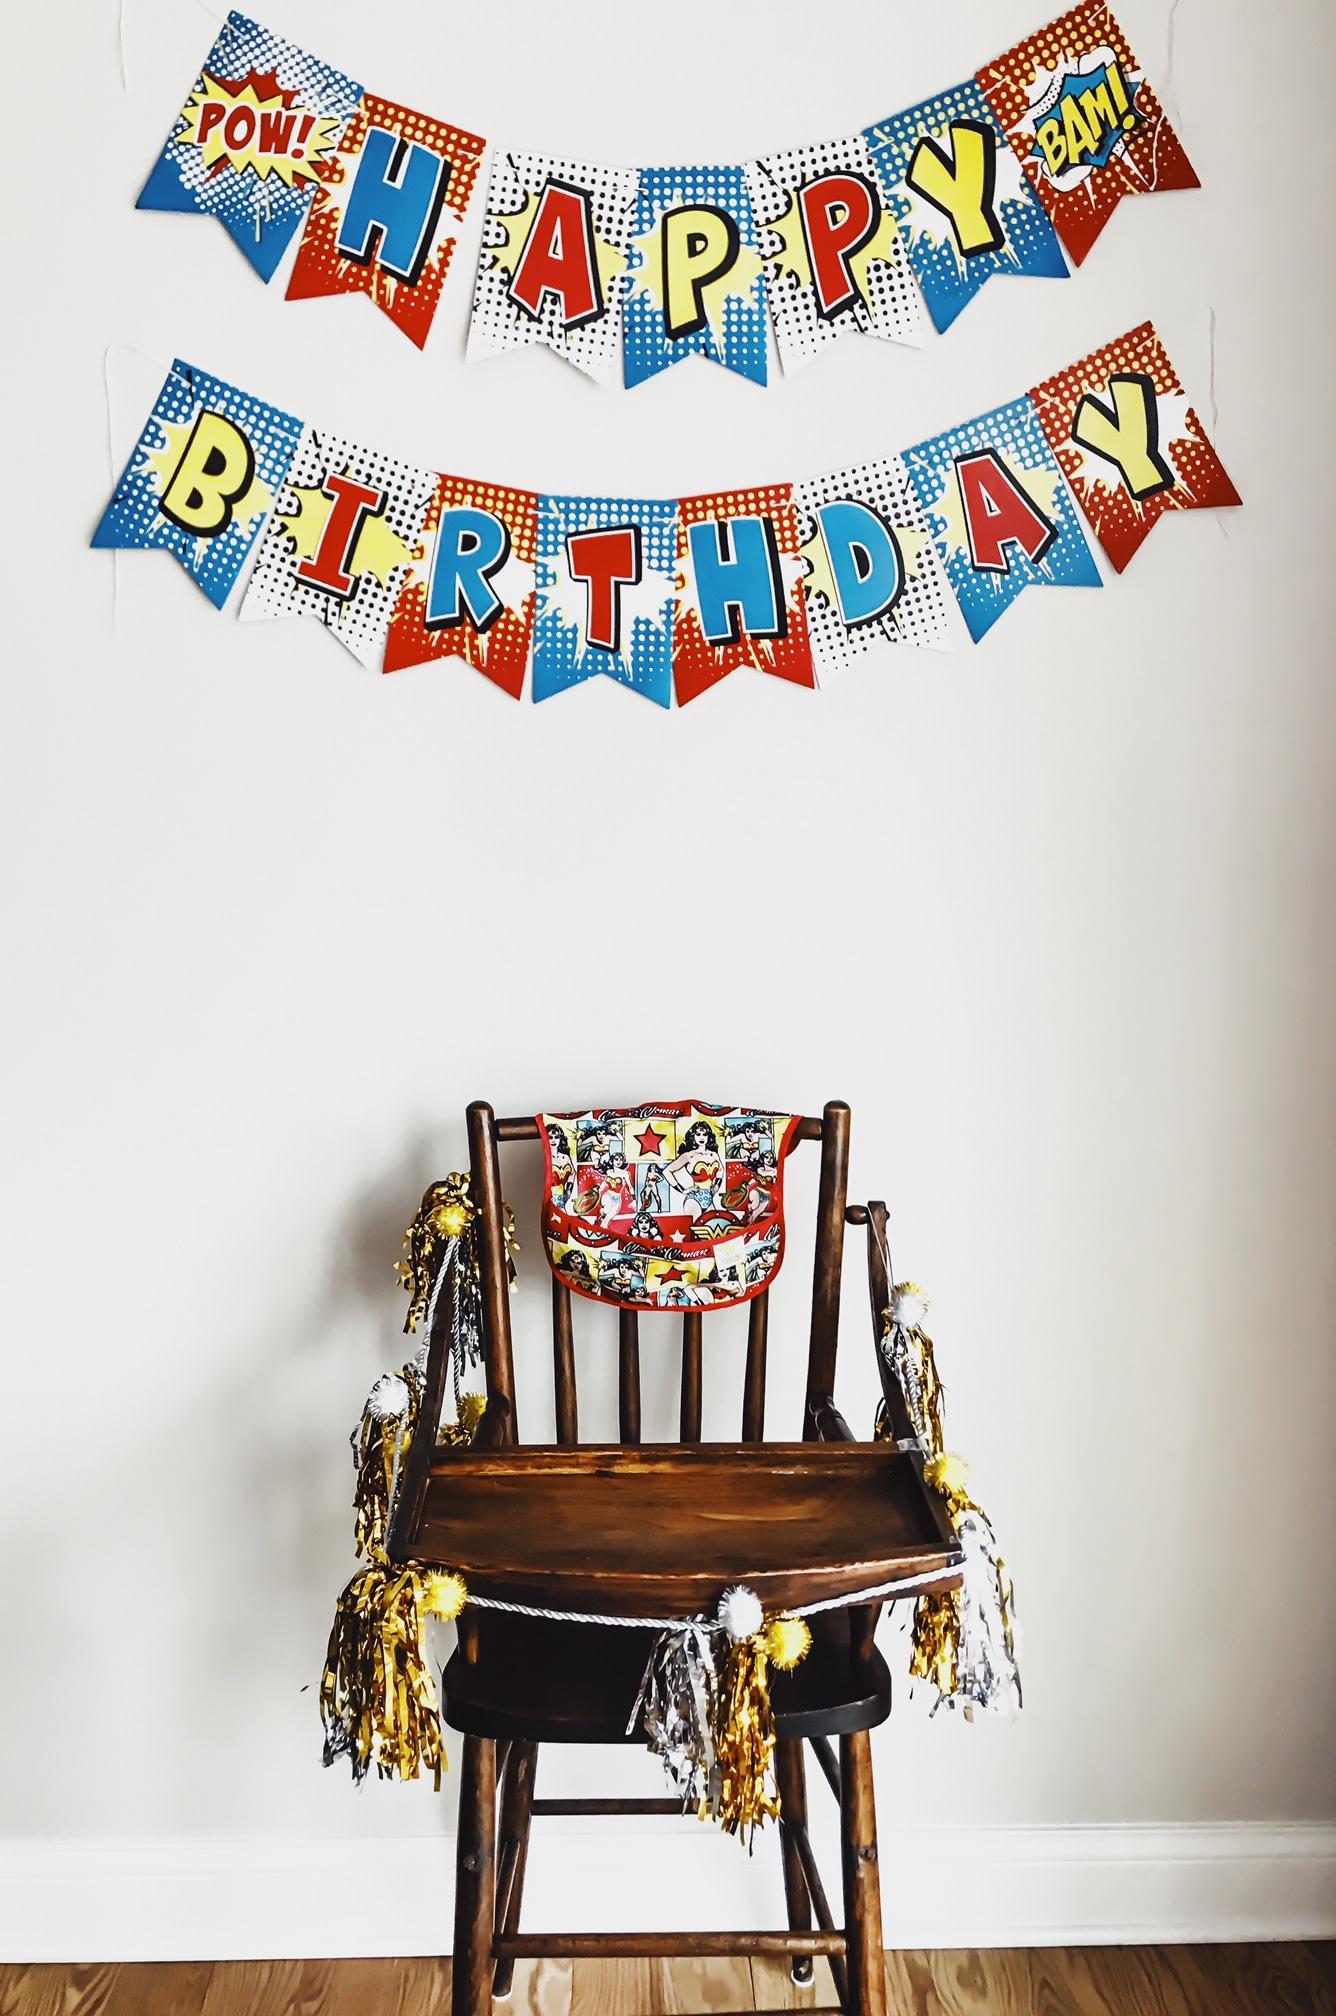 Wonder Woman High Chair Decor. Superhero birthday day party. Wonder Woman Onesie. Wonder Woman Superhero Birthday Party Theme Ideas. How to Plan a Wonder Woman Themed 1st Birthday Party. #sponsored #wonder#woman #birthday #party #decor